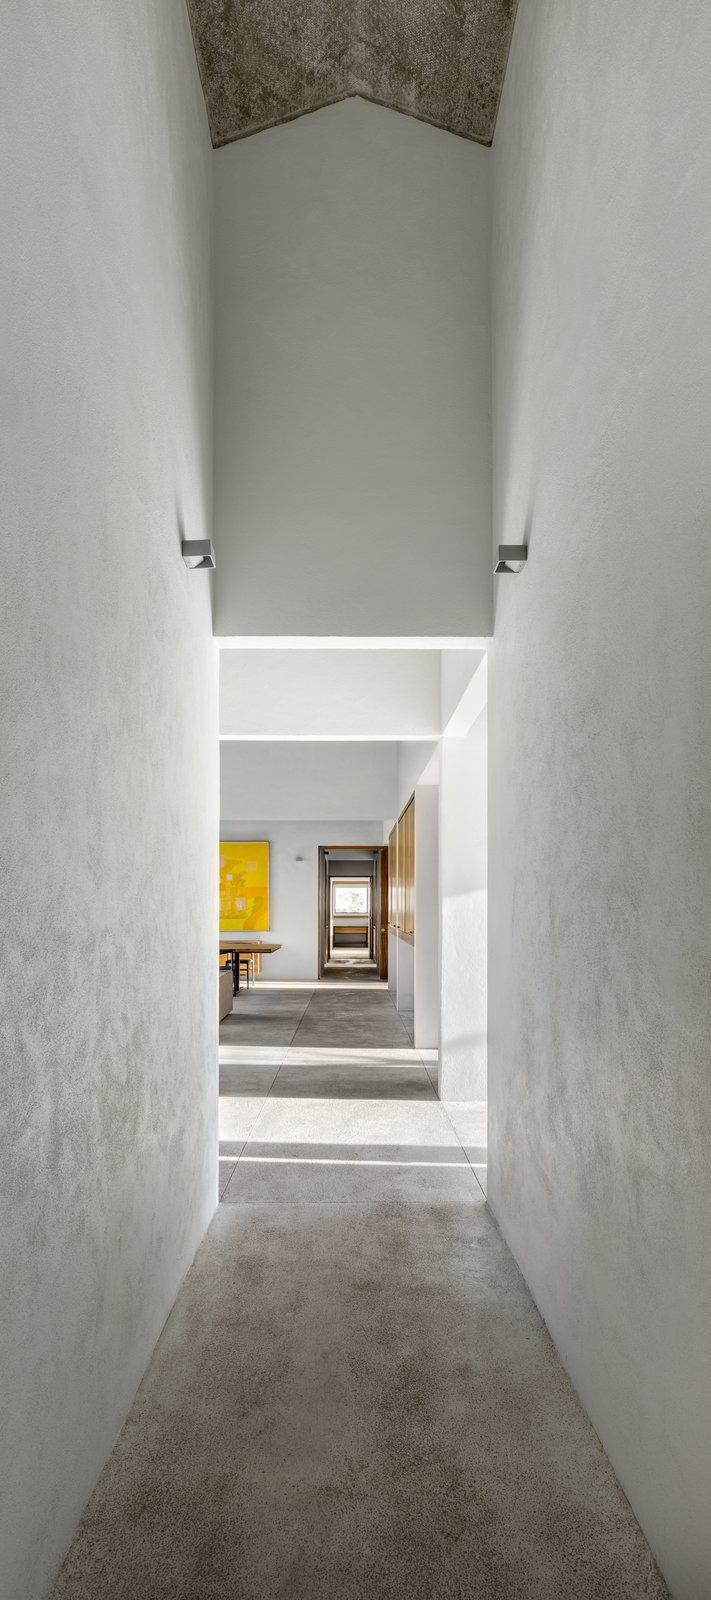 Hallway and Limestone Floor  Casa Paraíso Country Club by DCPP